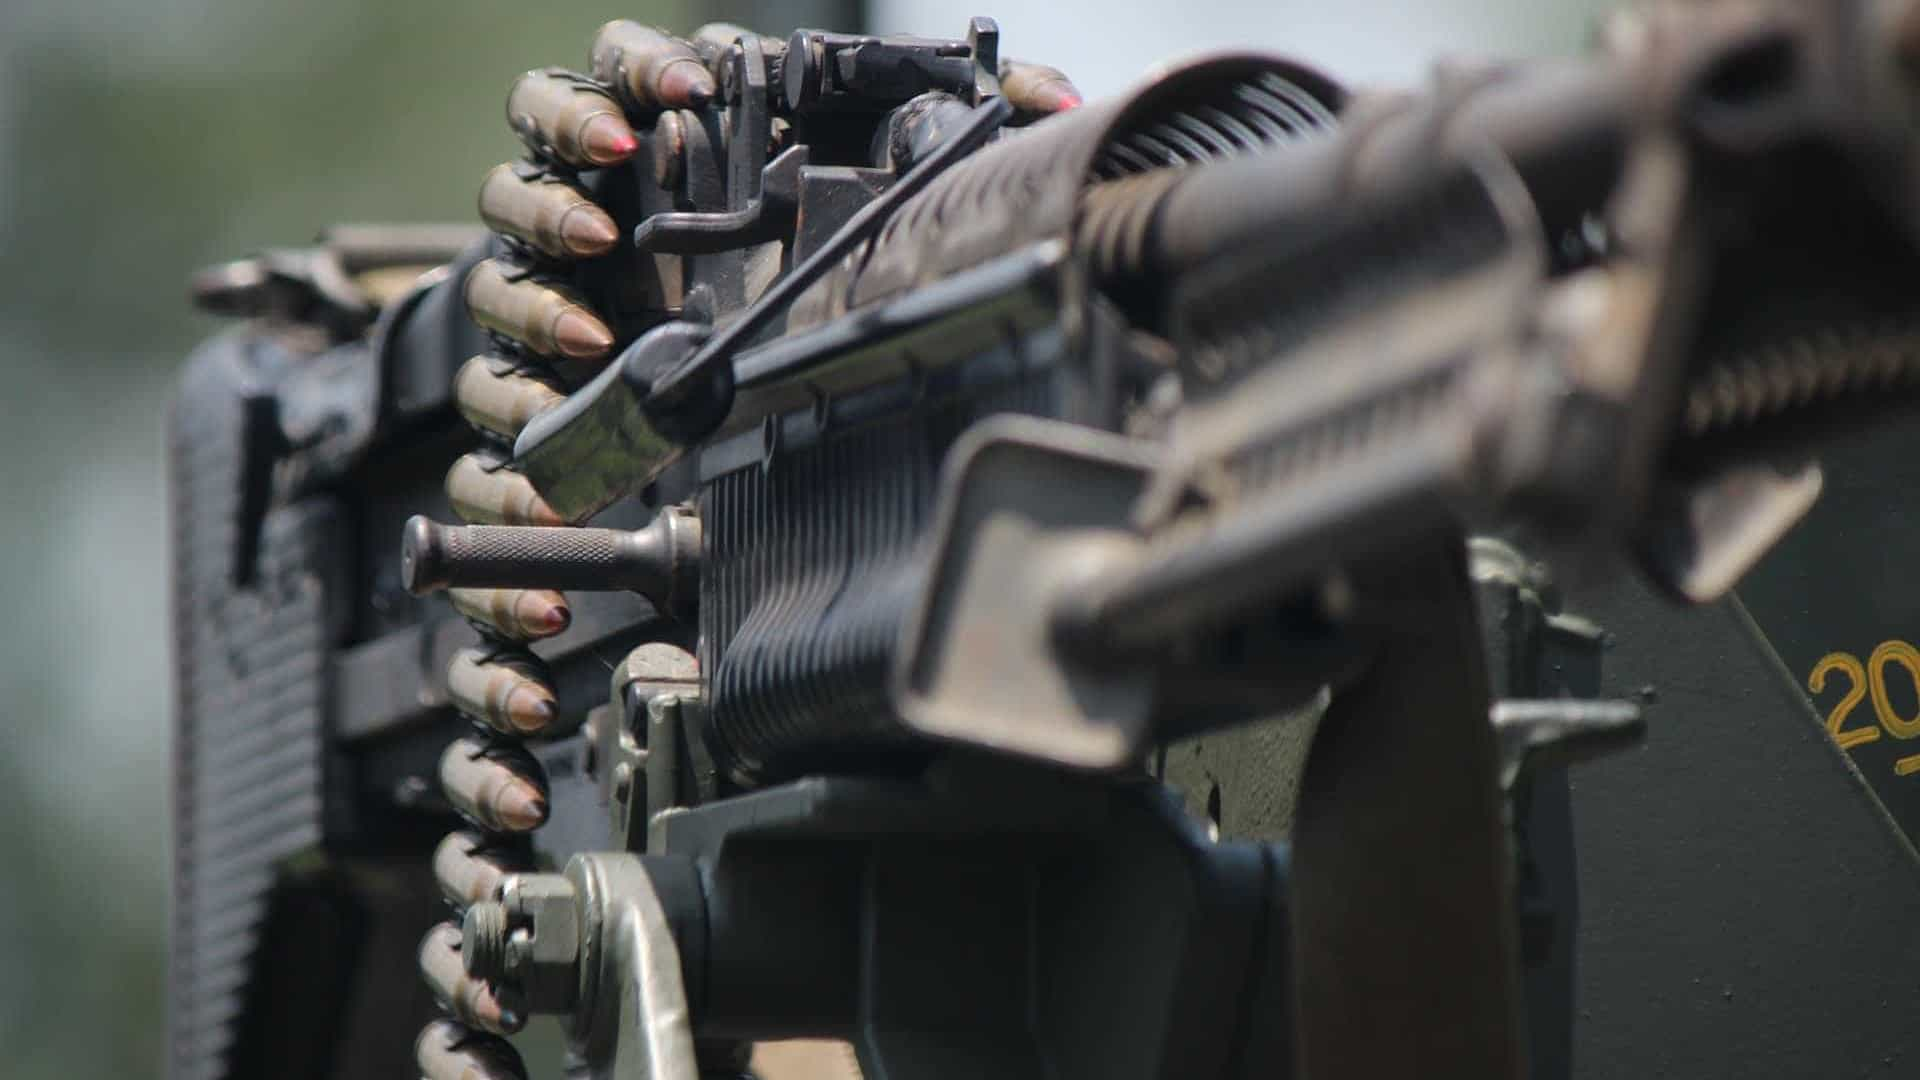 Rio: MPF pede suspensão de registros de armas por 'pico de homicídios'